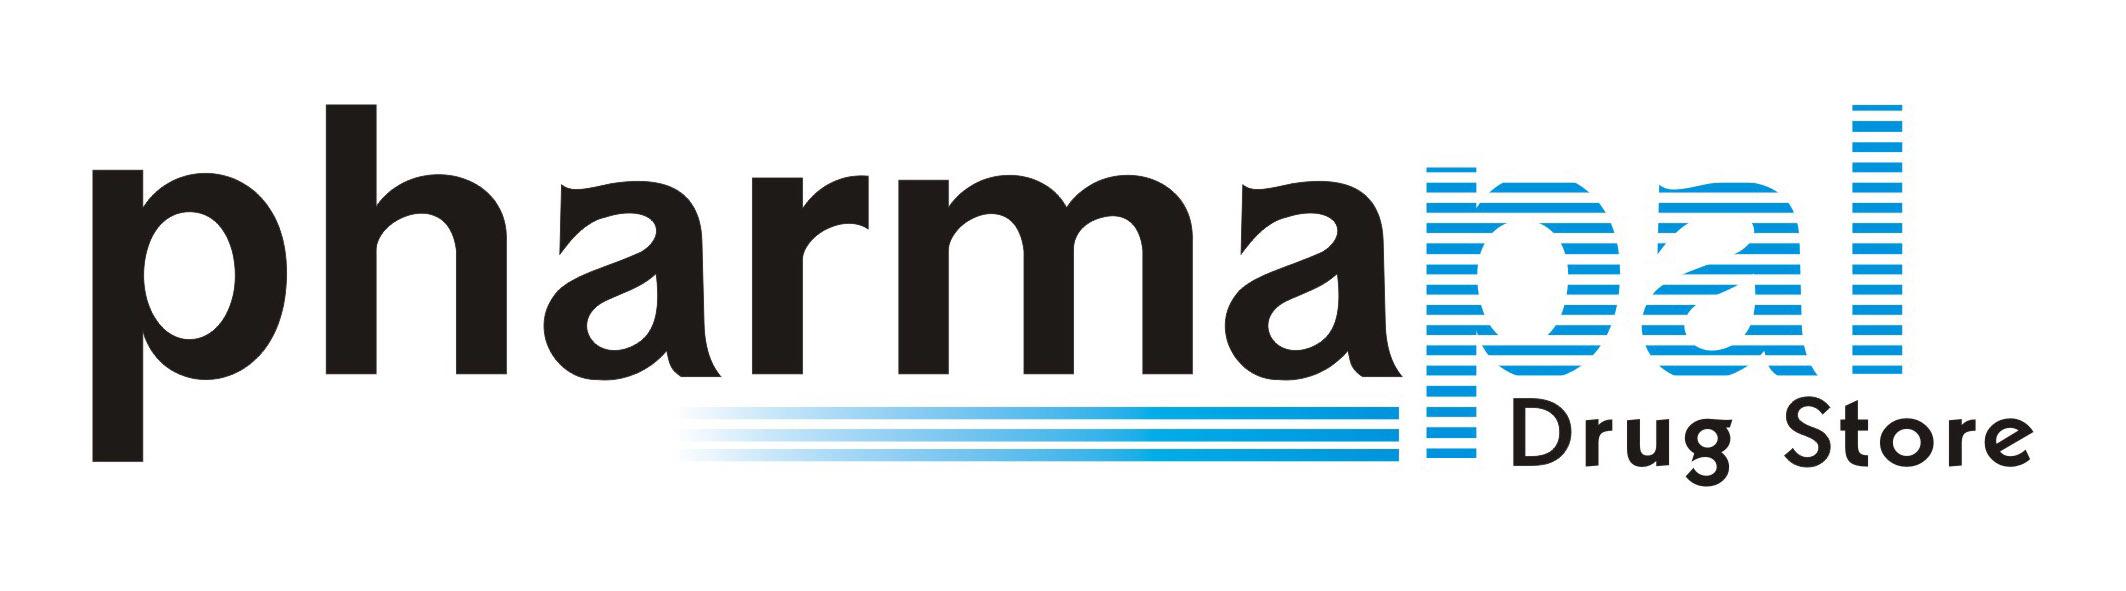 Pharmapal Drugstore